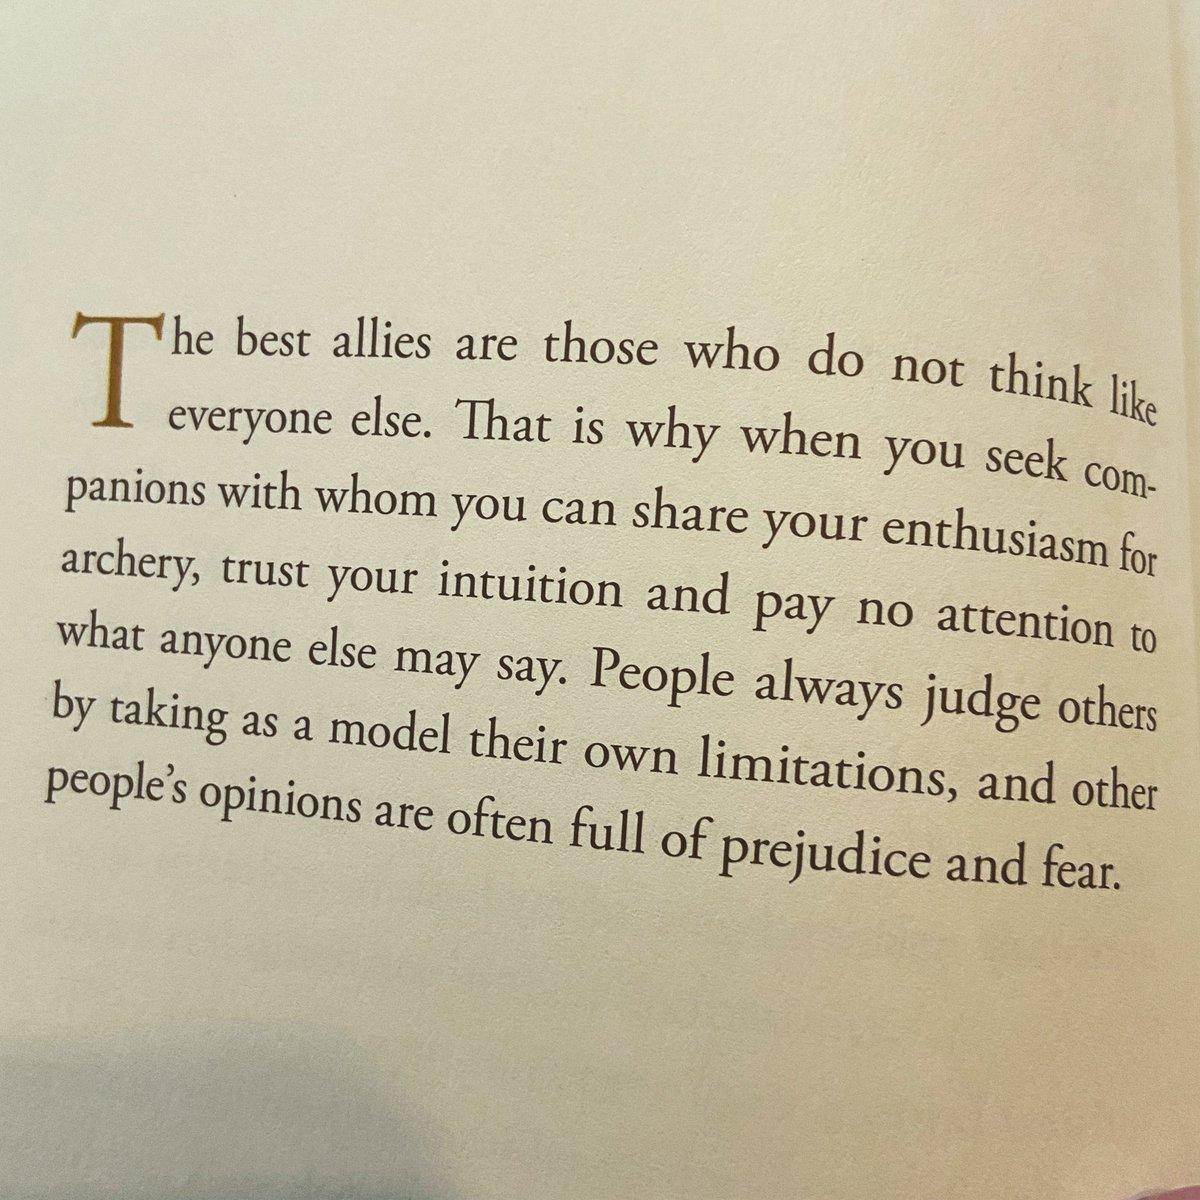 Trust your intuition...#prejudice #fear #SundayReads @bookpoets @reading_guru #TheArcher @paulocoelho #limitations 📖❤️